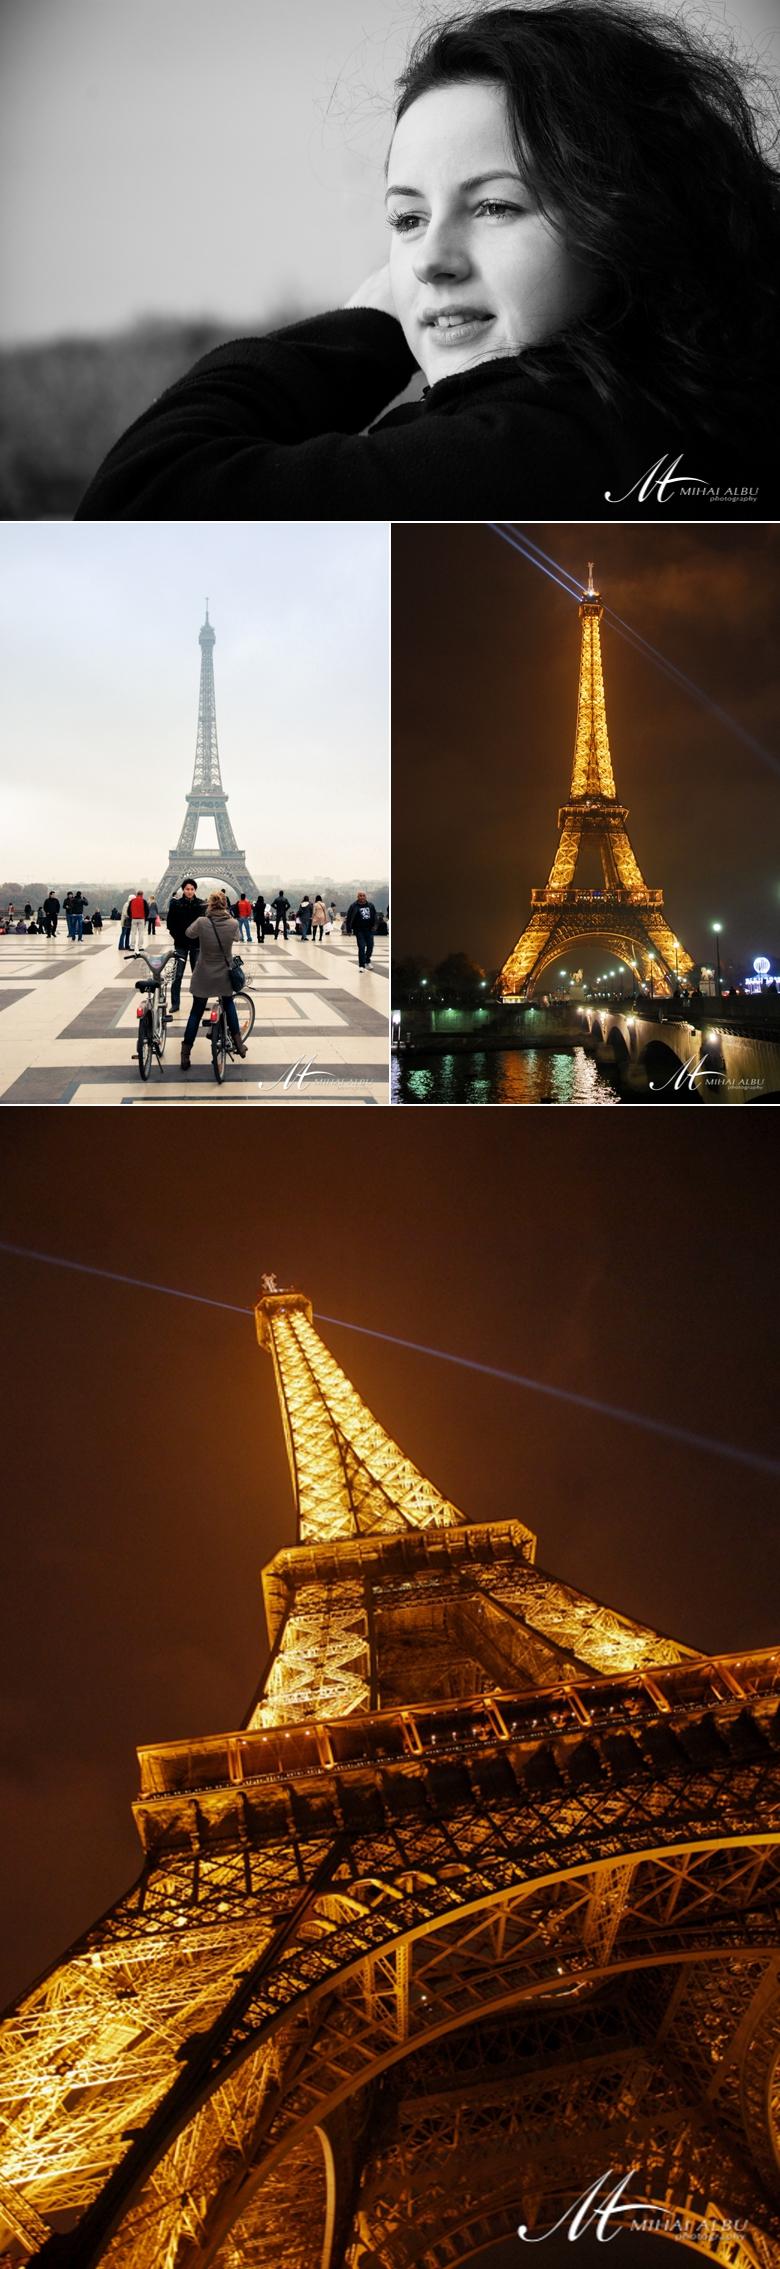 paris-poze-excursie-concediu-in-orasul-iubirii-turnul eiffel-muzeul-luvru 6